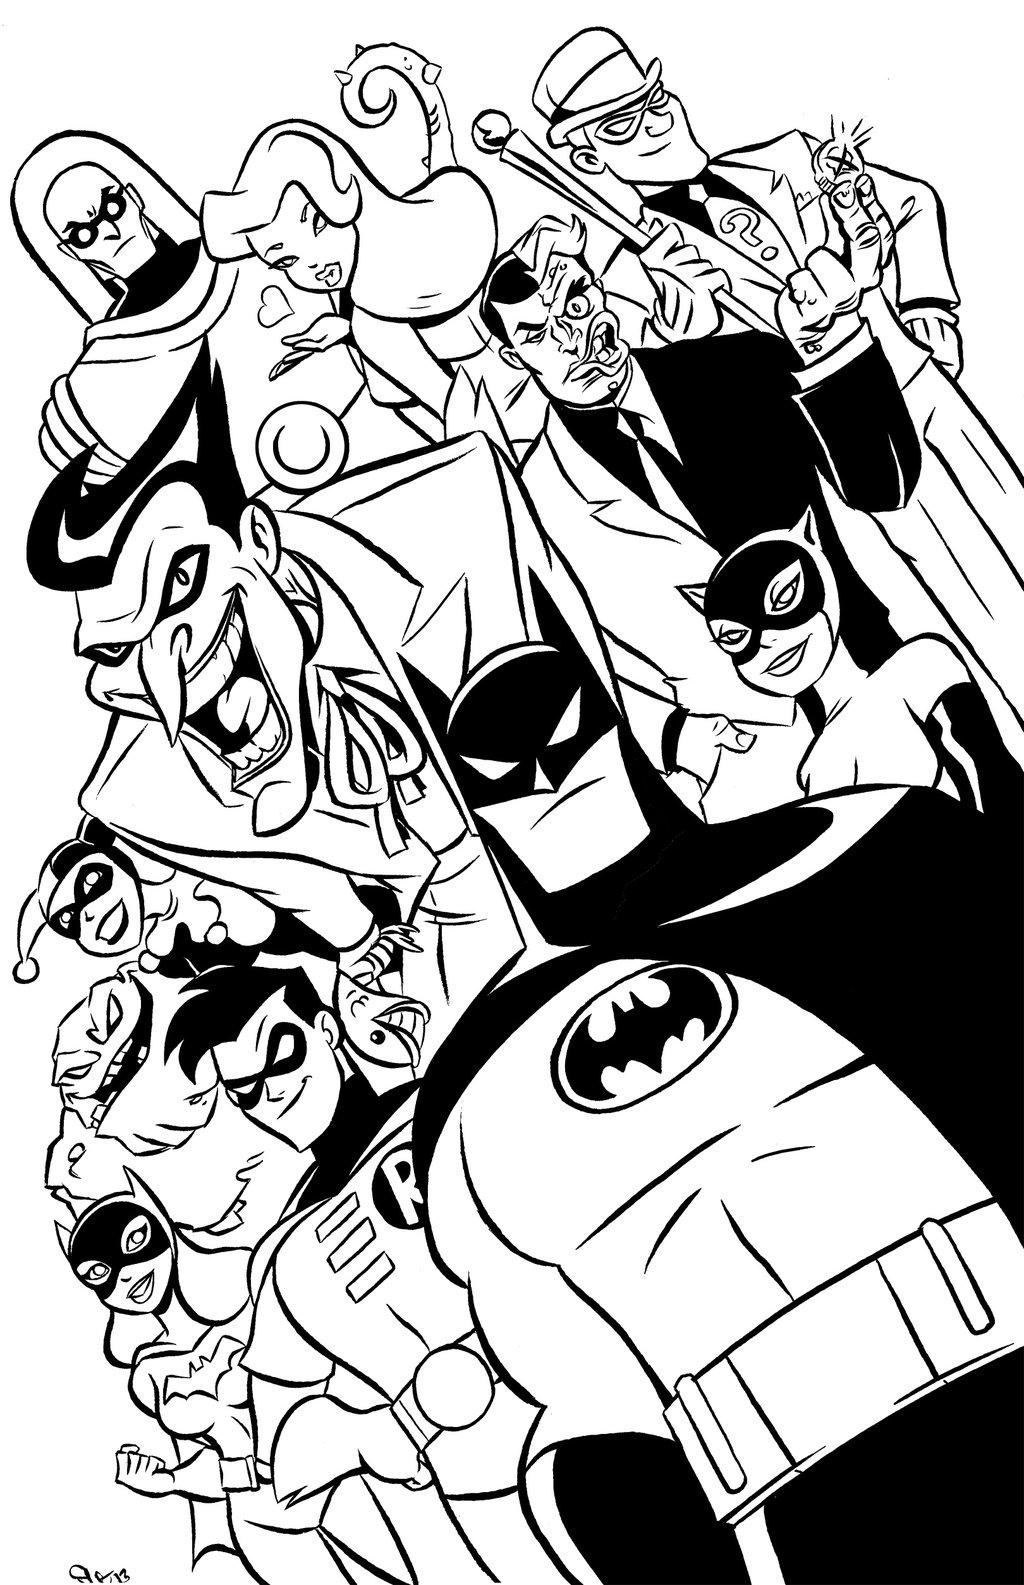 Batman Cartoon Drawing at GetDrawings.com | Free for personal use ...